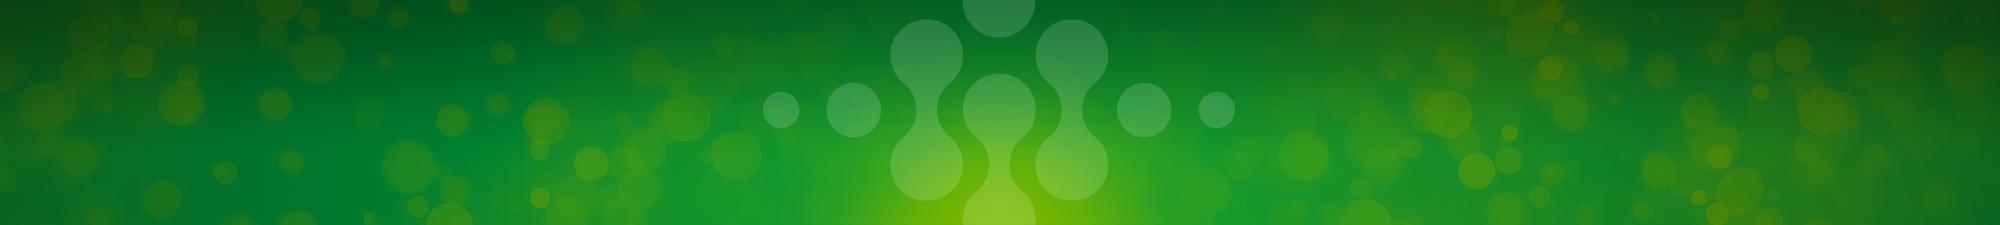 AUDIO-Entetes2020-2000x225-Green-03